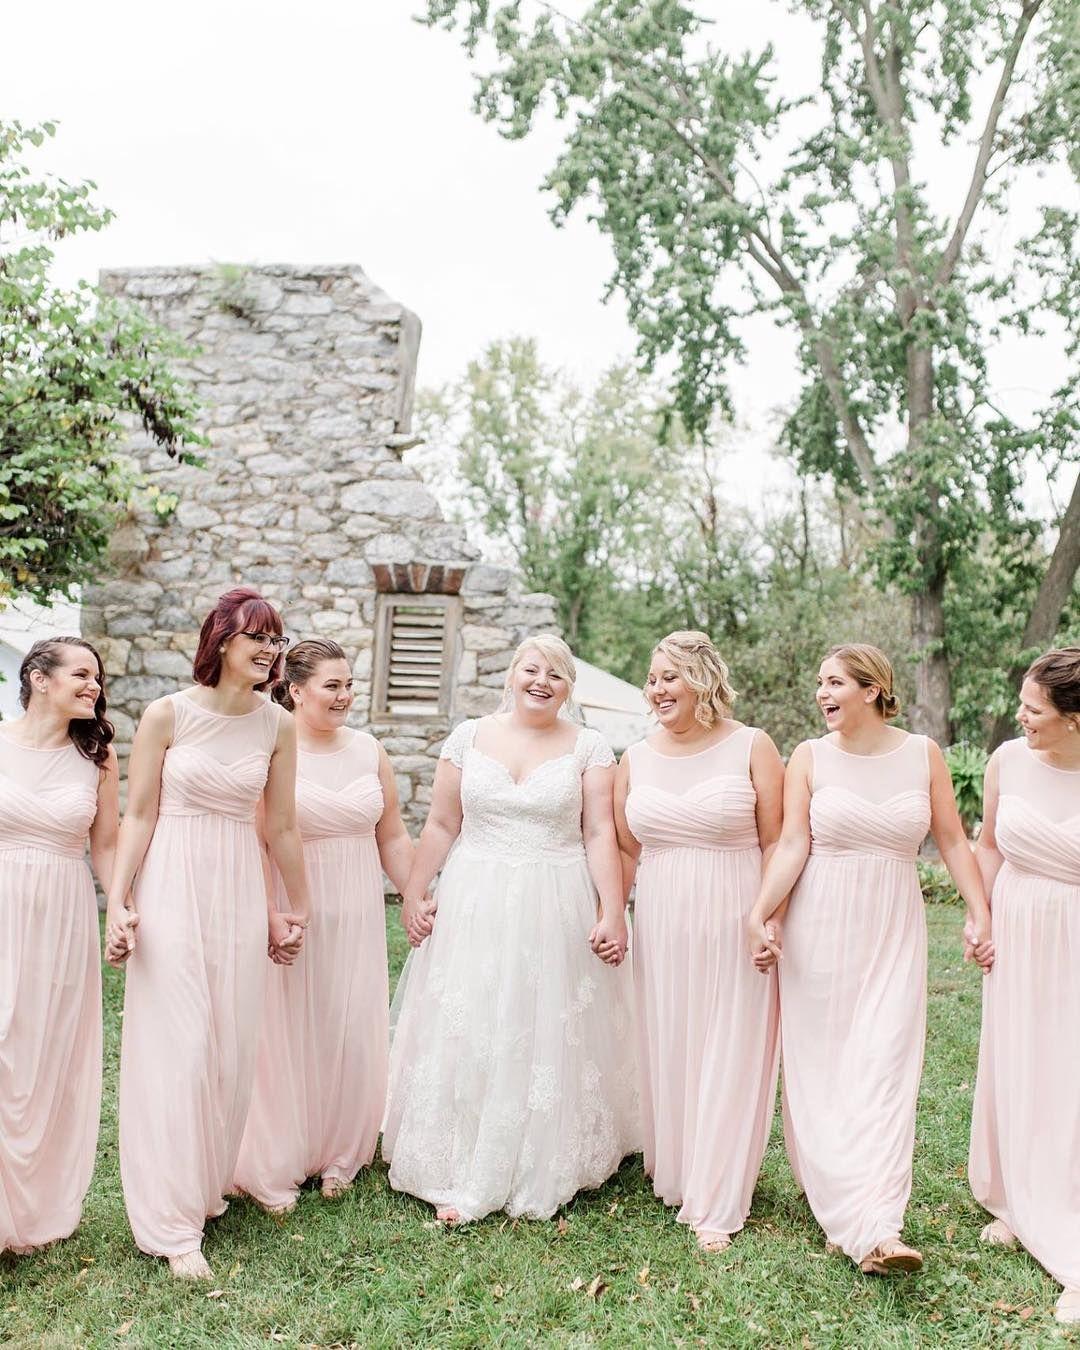 616328f29b David s Bridal bridesmaids in illusion neck long bridesmaid dresses in  pastel pink. See style F15927 in Petal from David s Bridal